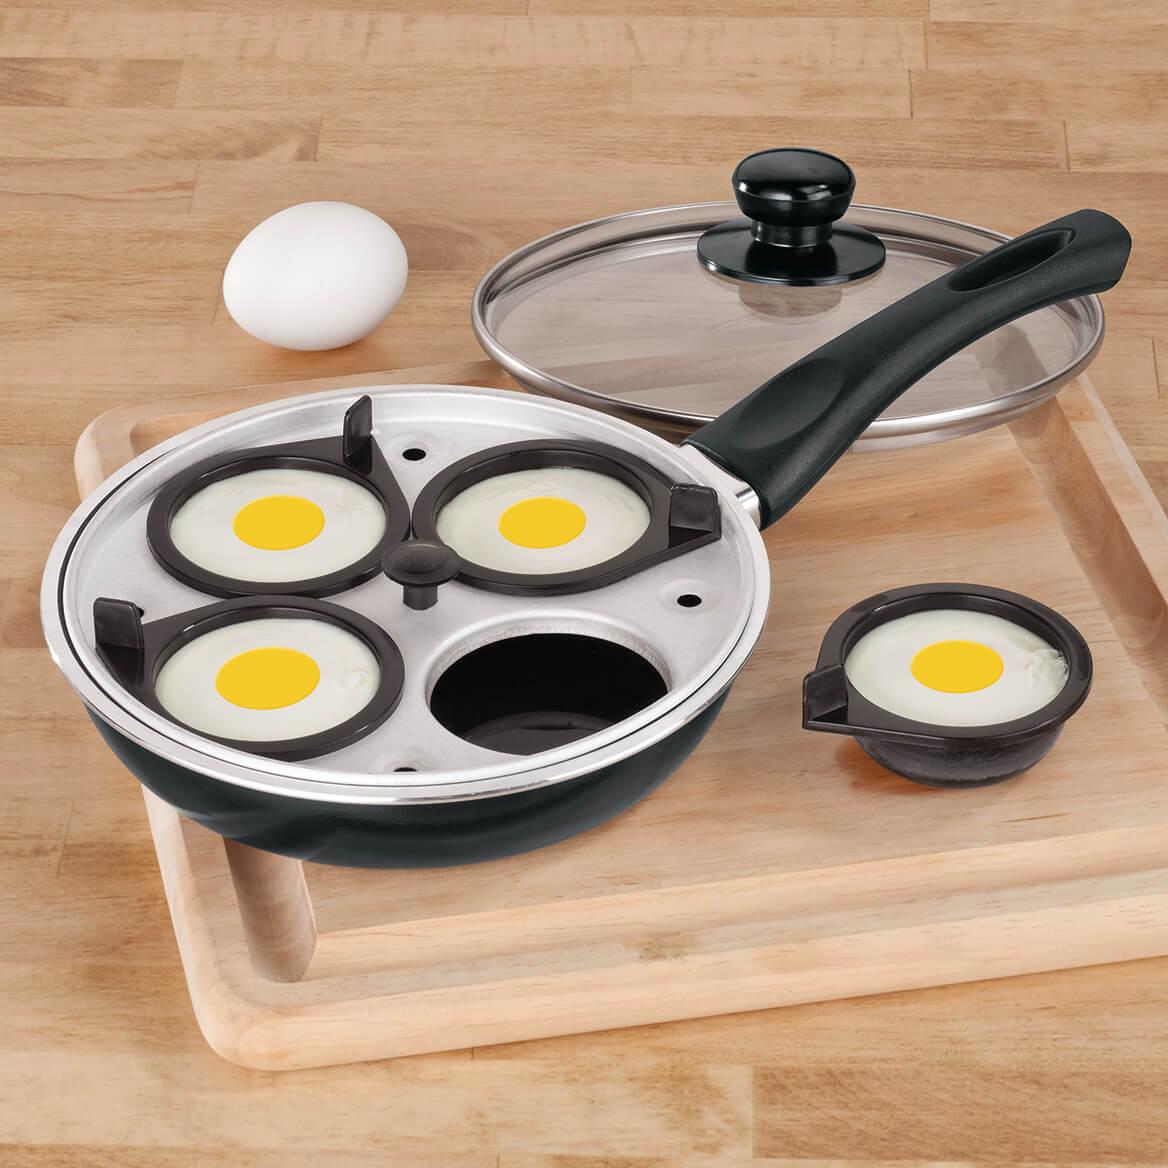 Frying Pan with Egg Poacher Insert-349130